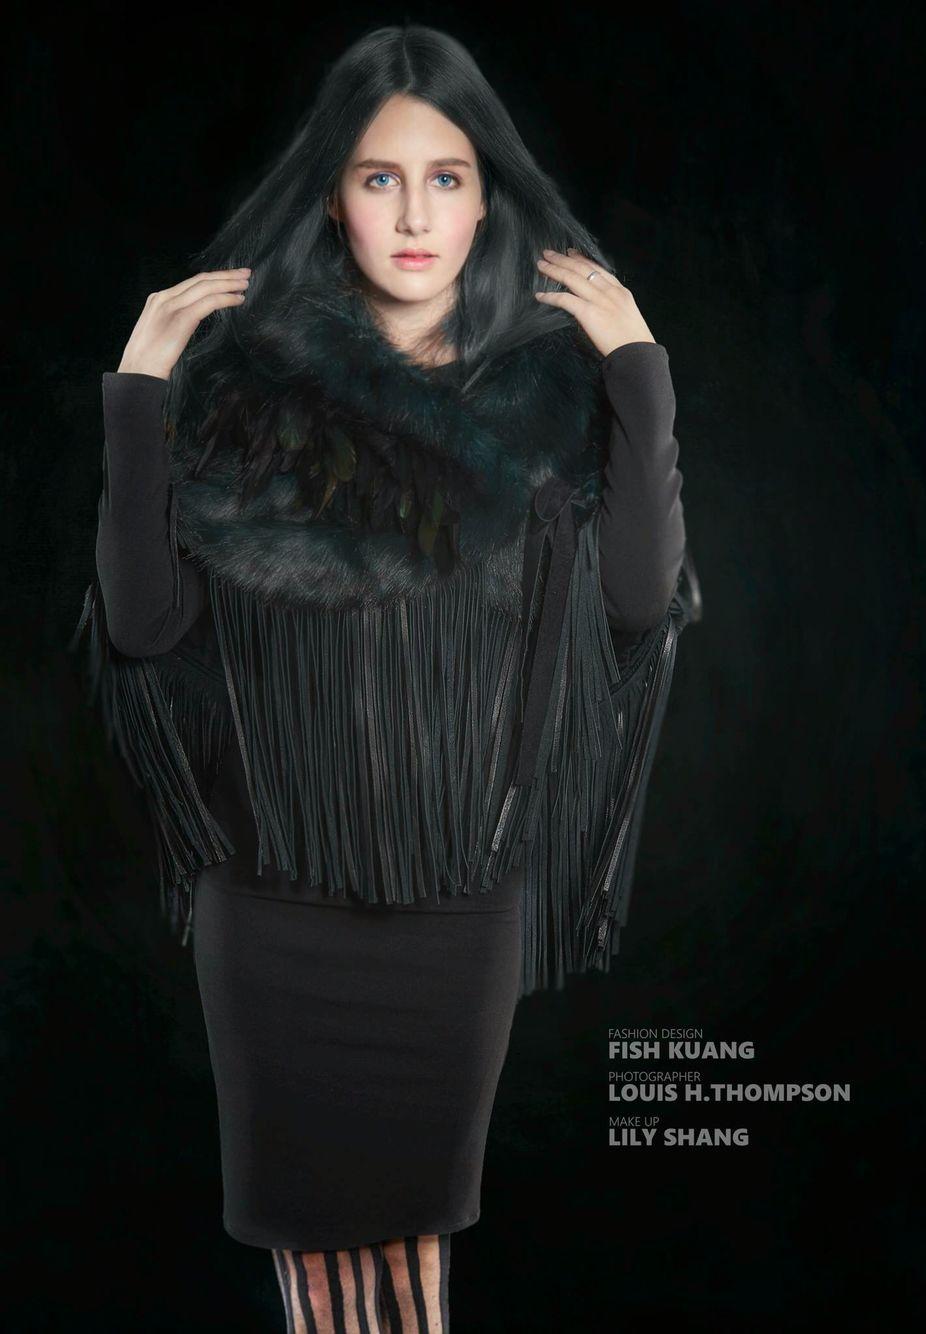 Fashion Design Fish Kuang Photographer Louis H.Thompson Make-Up 張玲雪 Model 陳雪兒